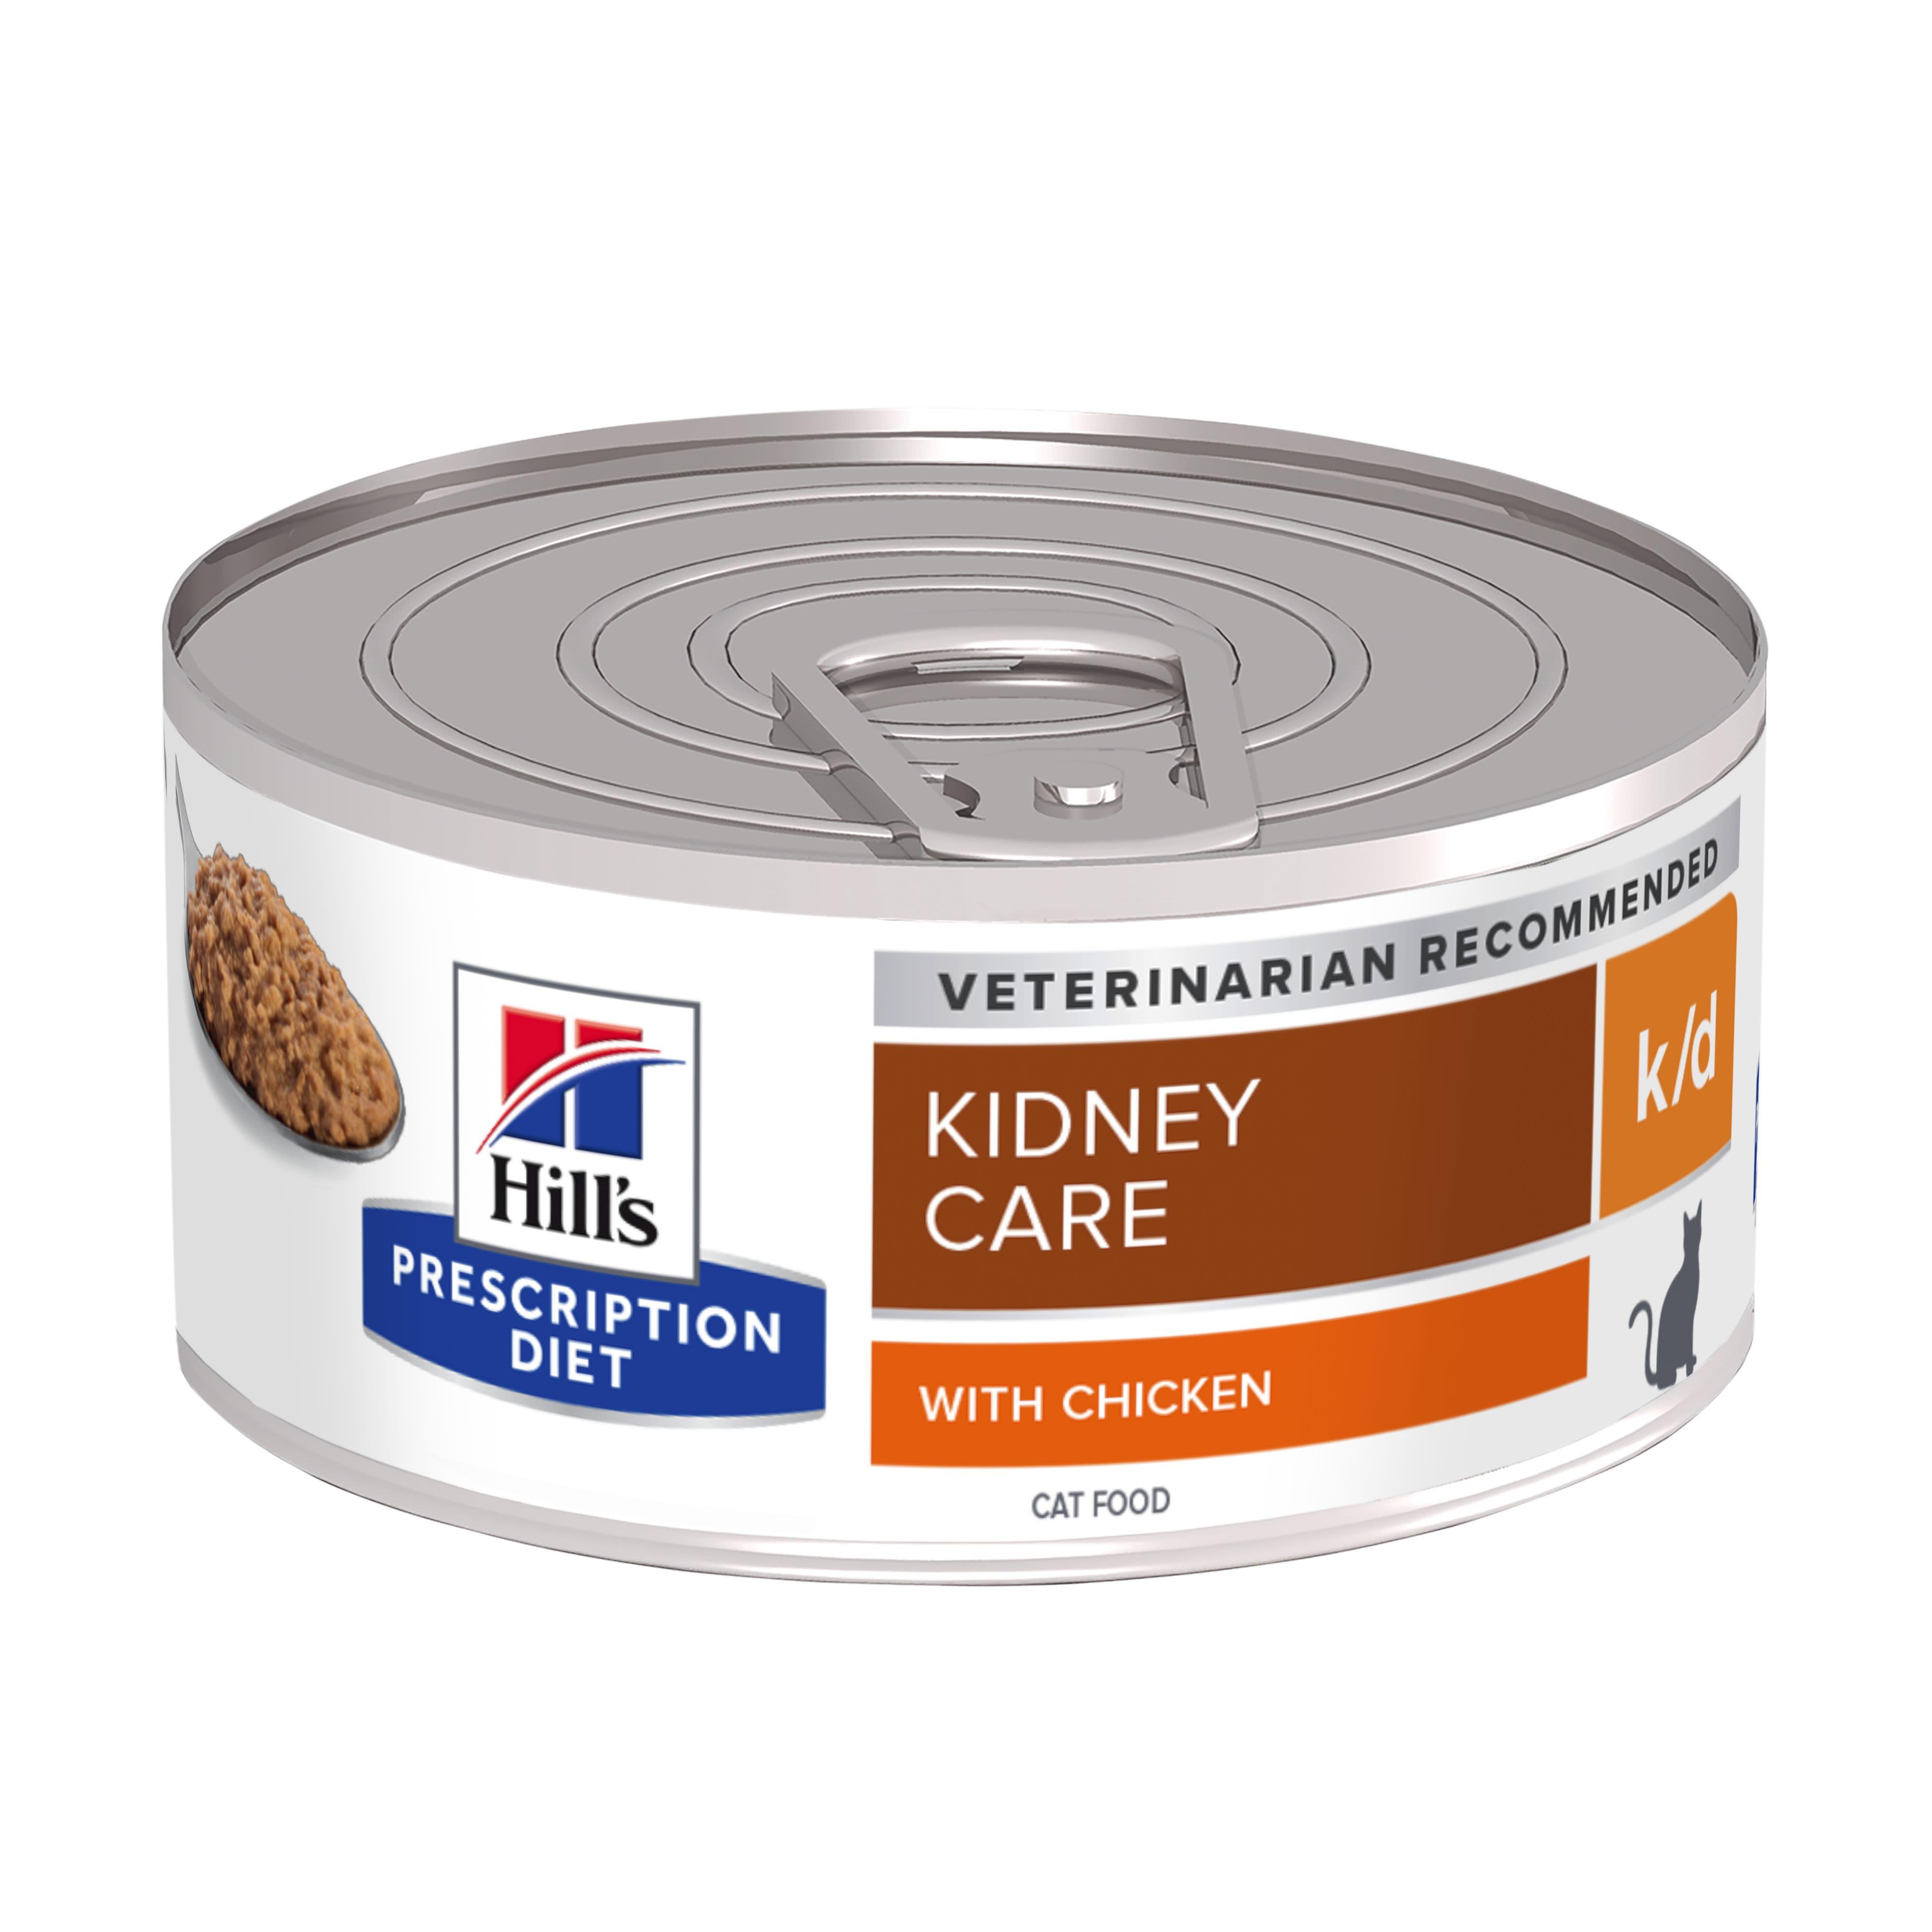 Hills Prescription Diet K D Feline Cat Food